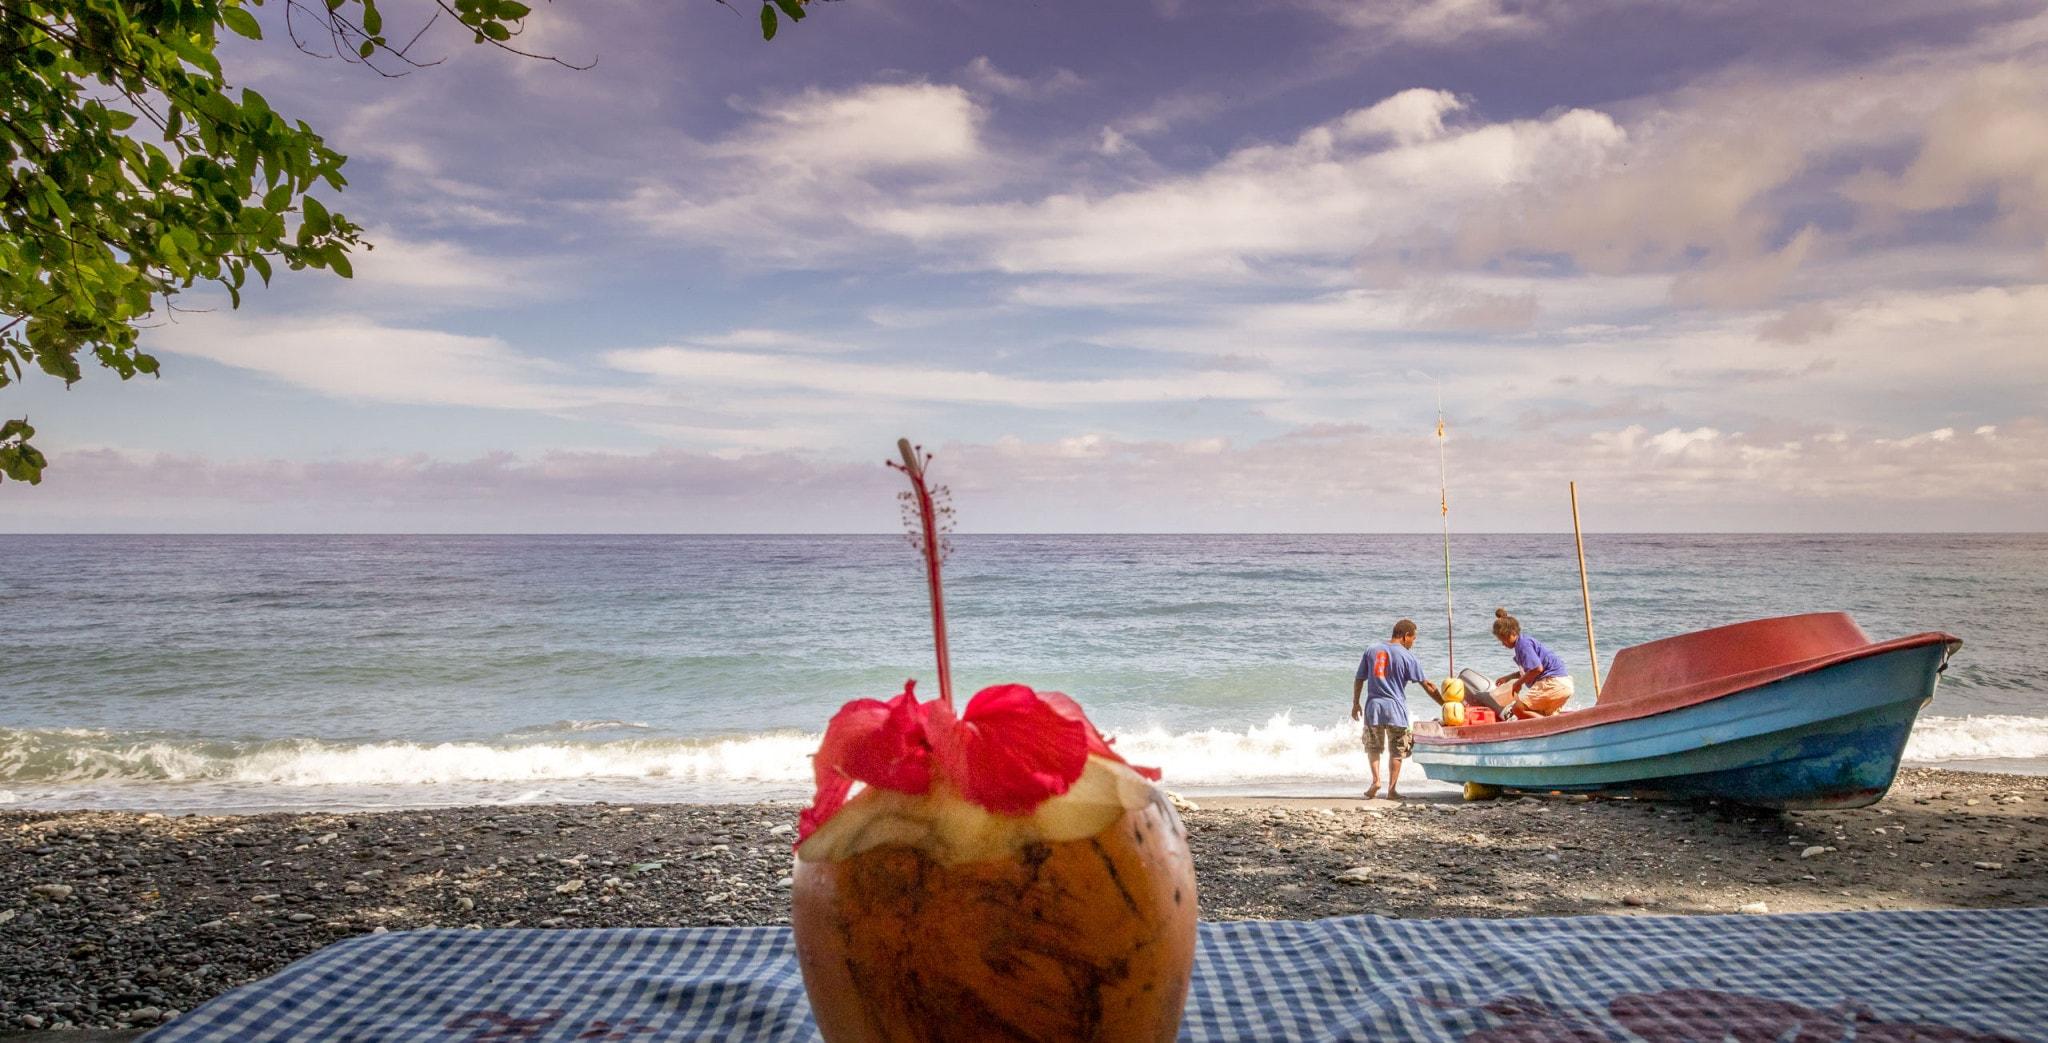 SOLOMON ISLANDS - Savo Island day trip from Honiara (Guadalcanal)